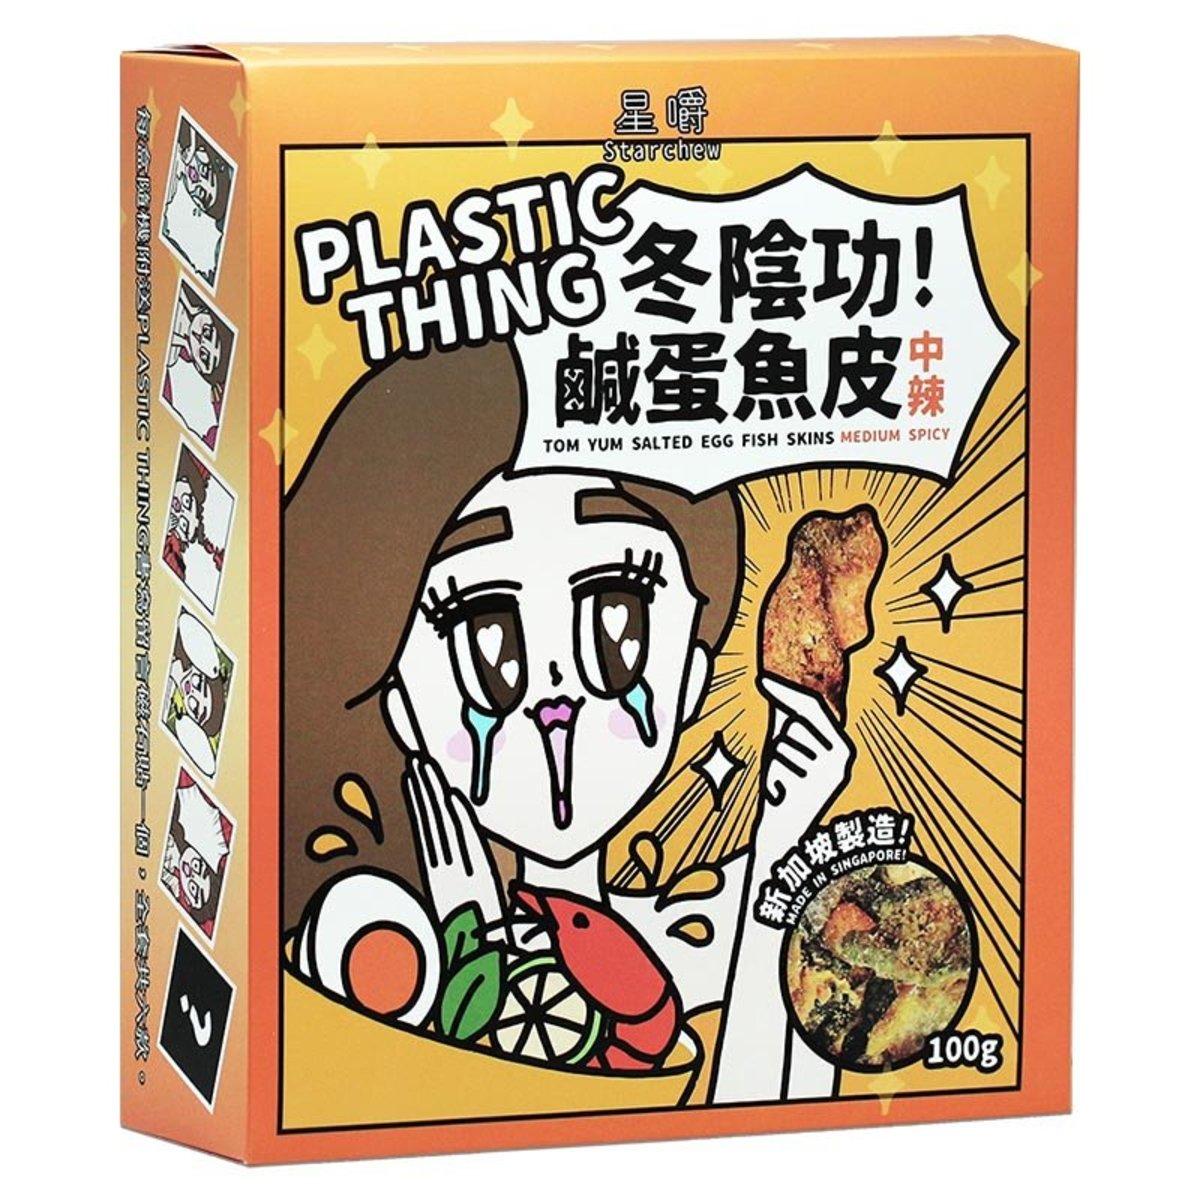 Plastic Thing 「 Tom Yum 」 Salted Egg Fish Skin Crisps